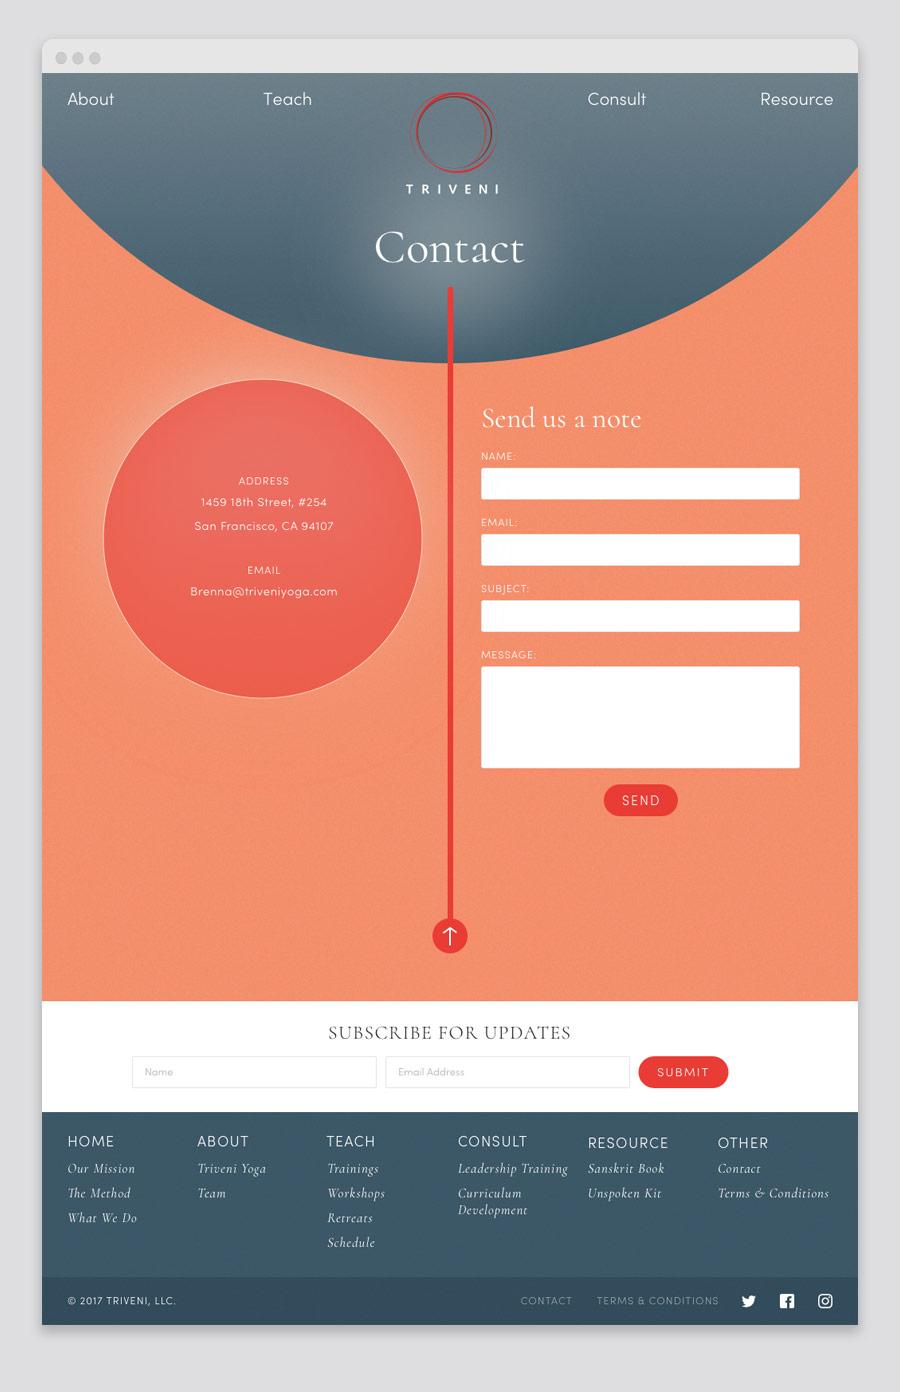 UME-Triveni-Web-Contact.jpg